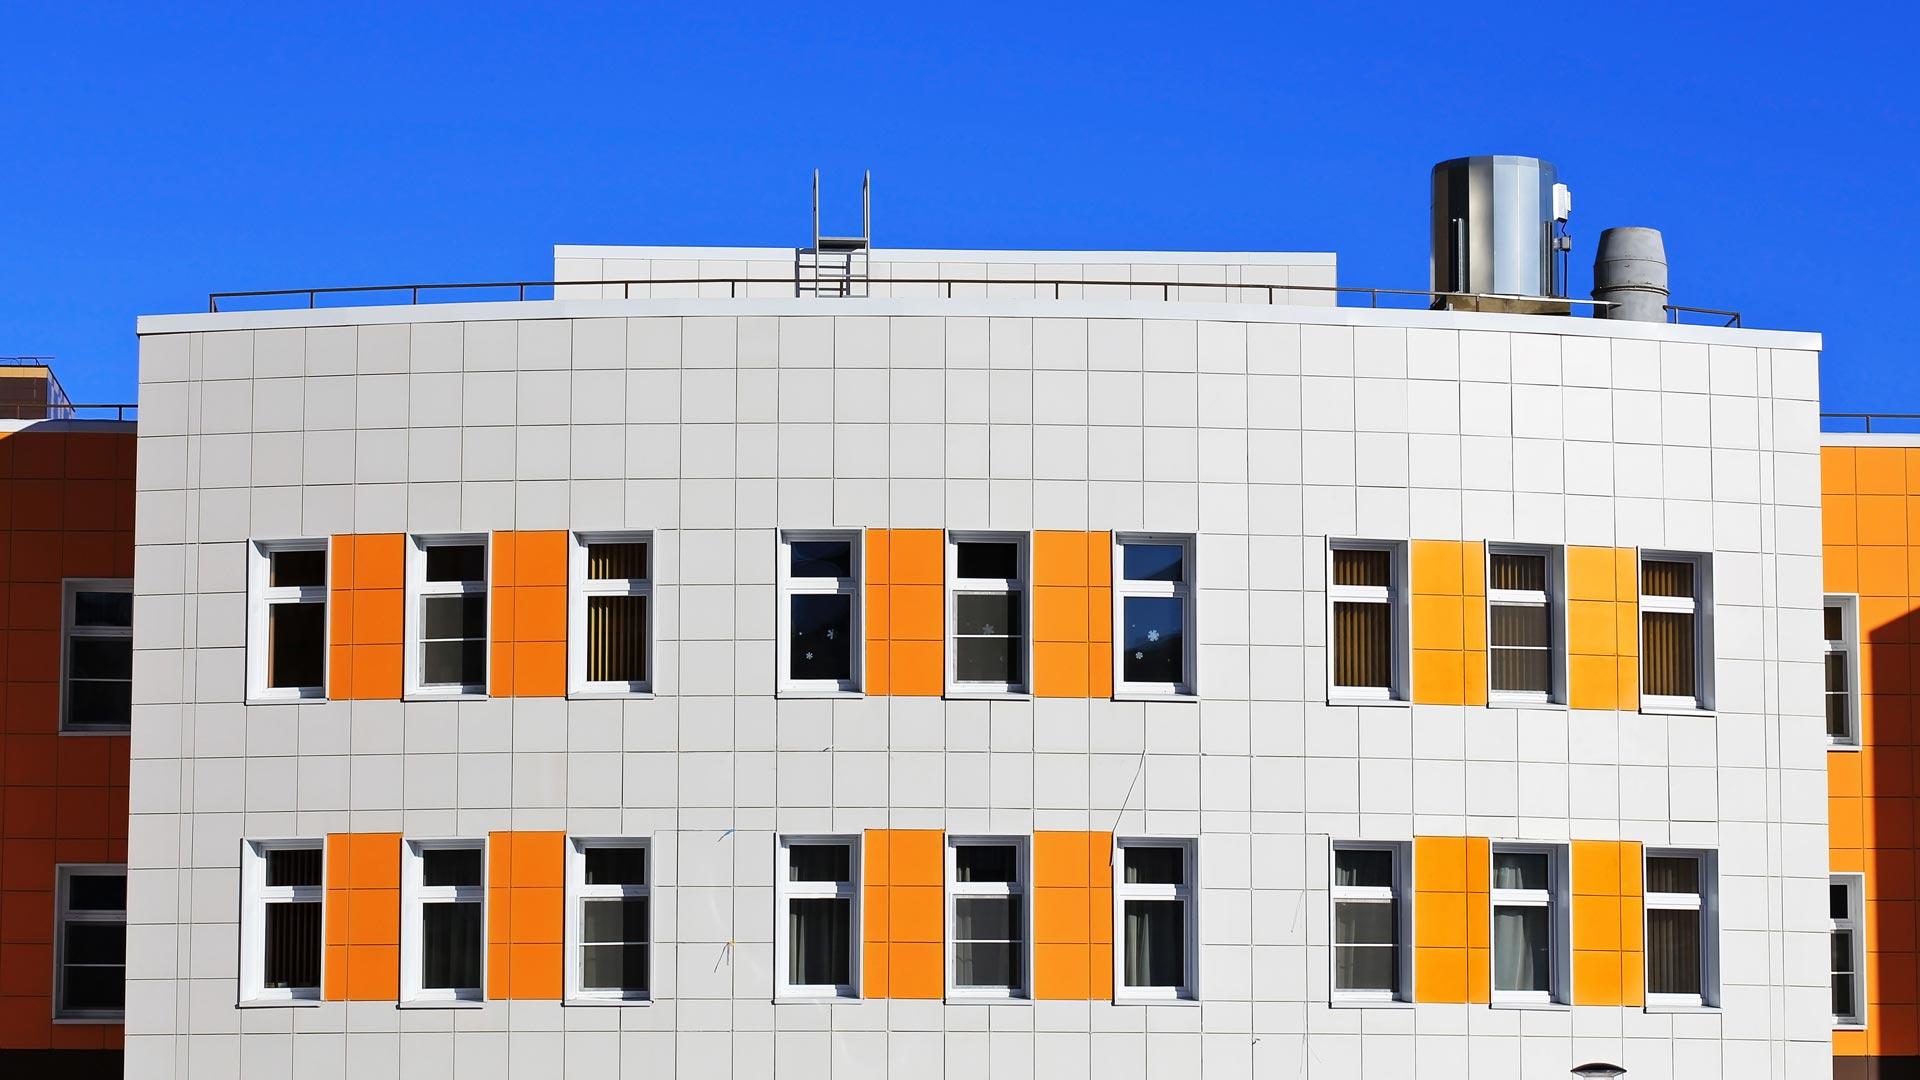 Fachada ventilada porcel nica fachadas ventiladas - Fachadas ventiladas de piedra ...